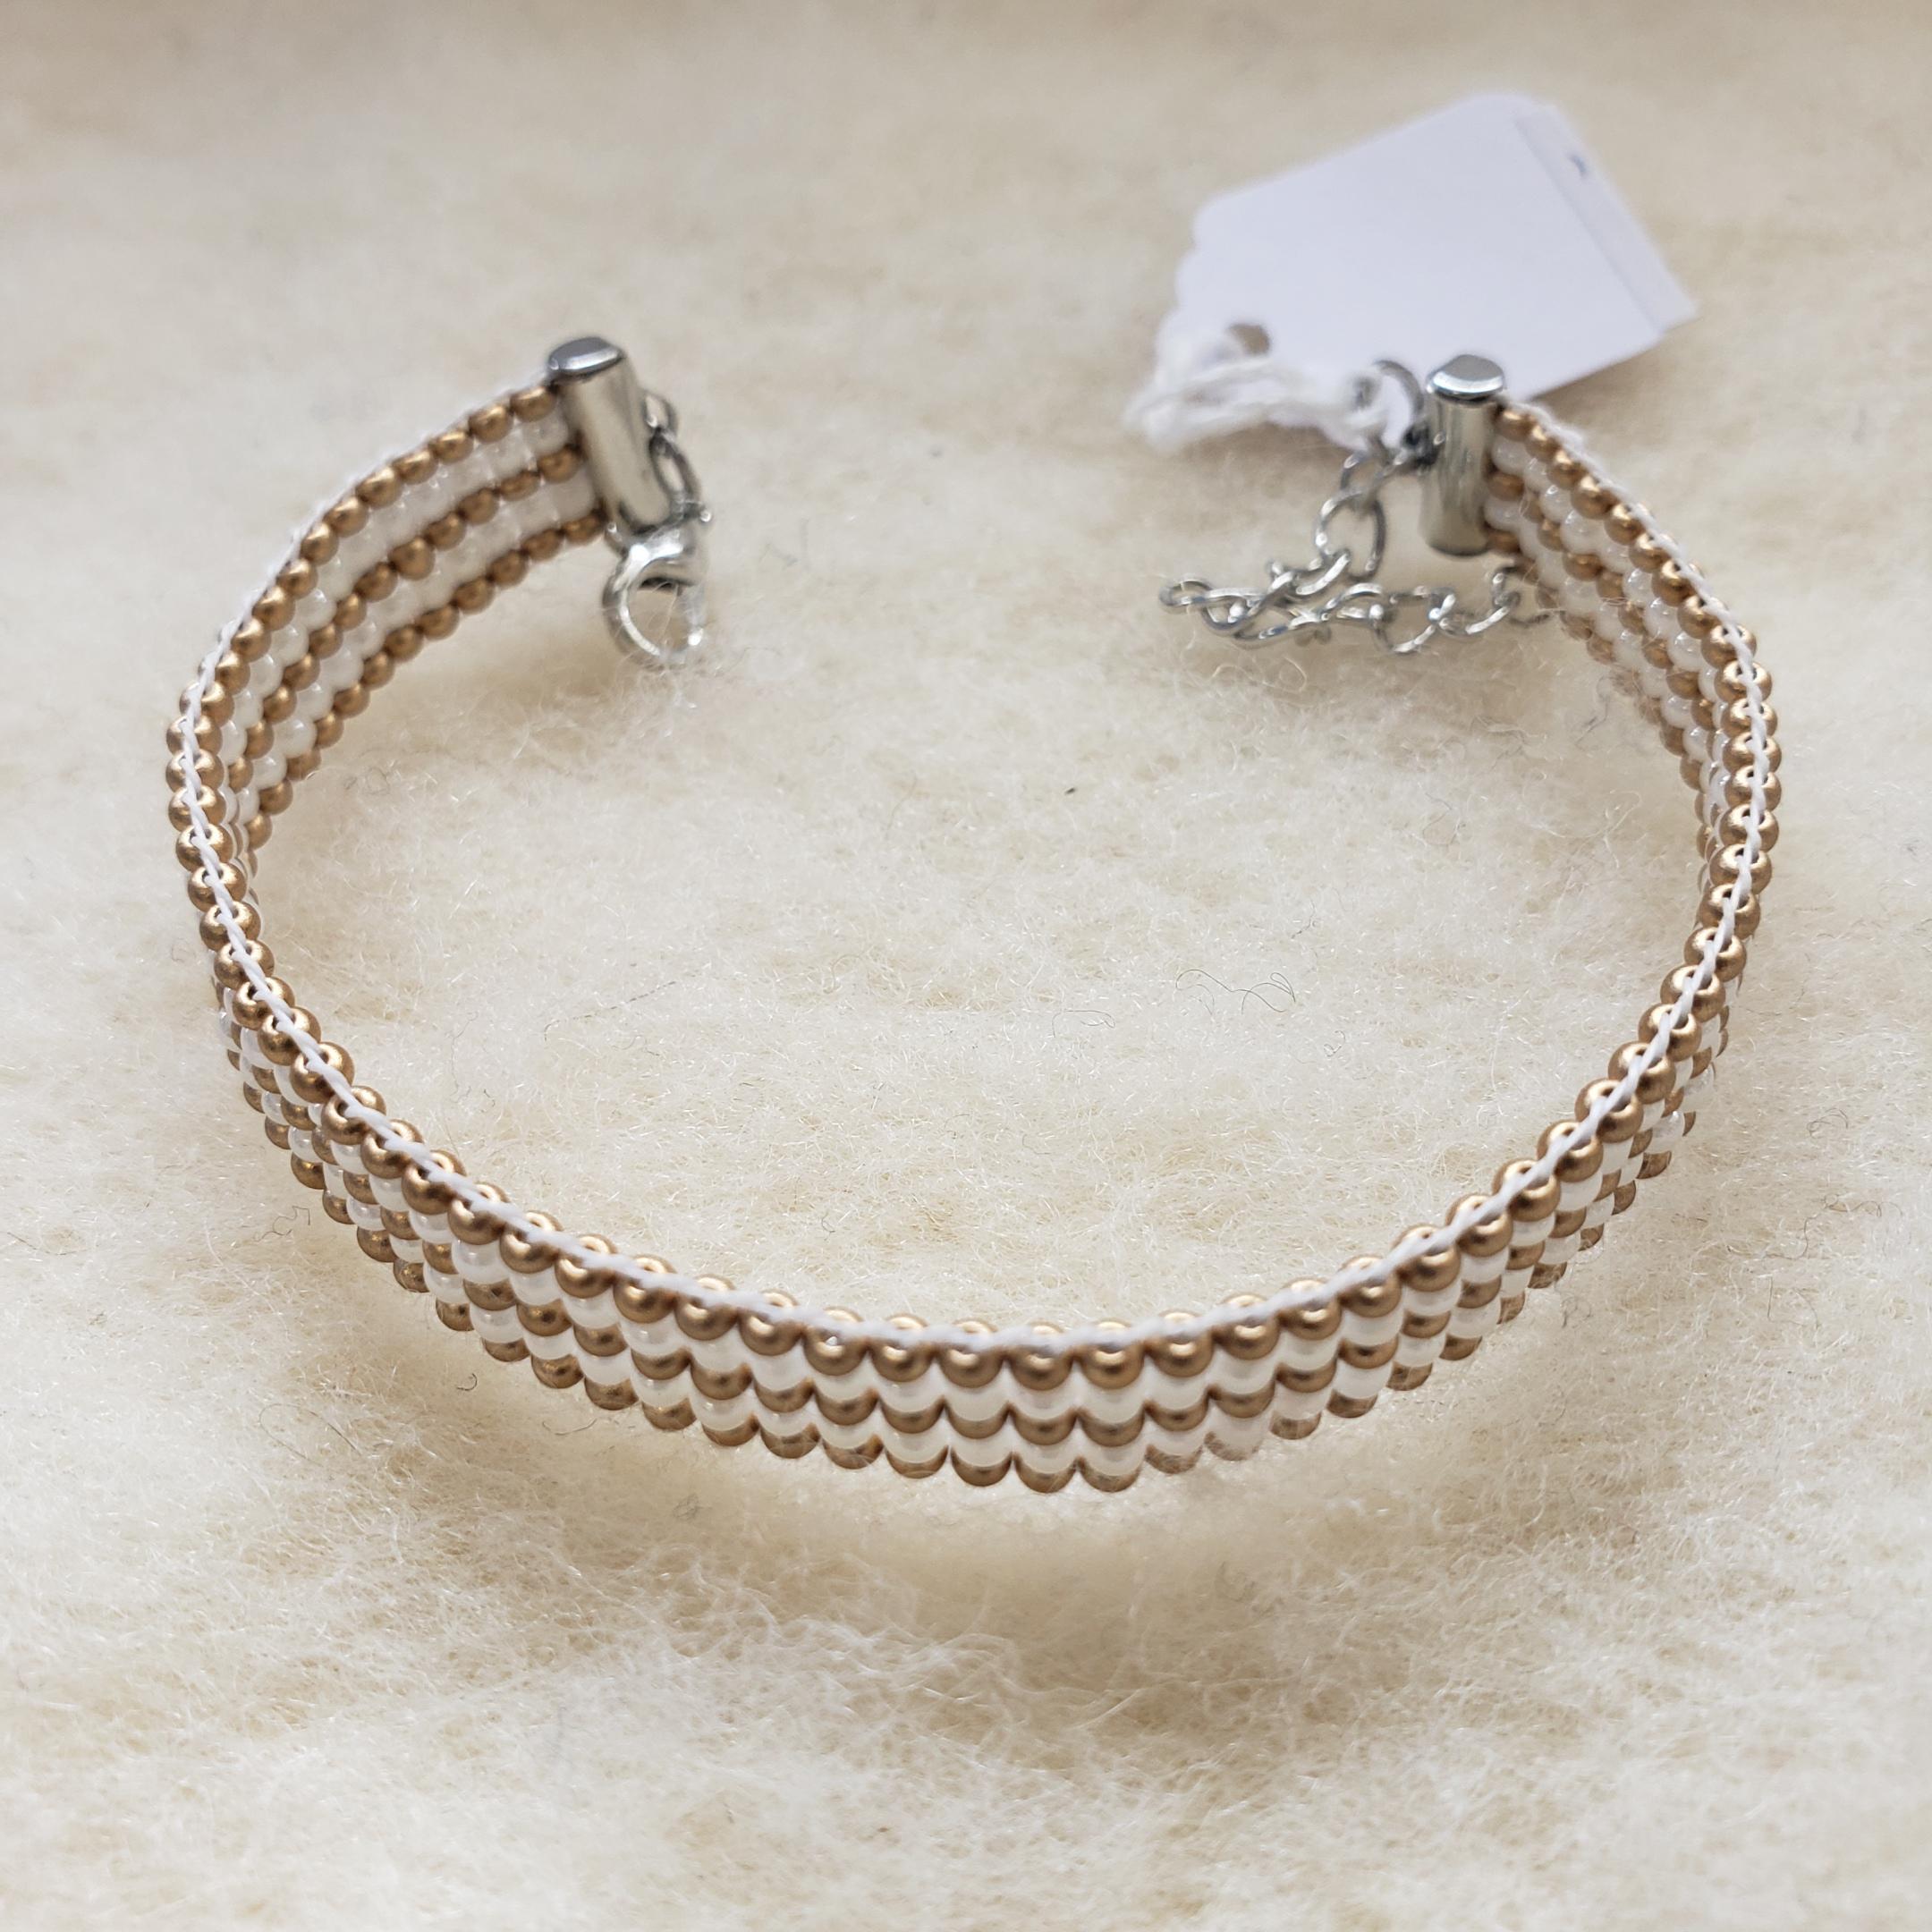 35-Beaded Bracelets (Adjustable Length)